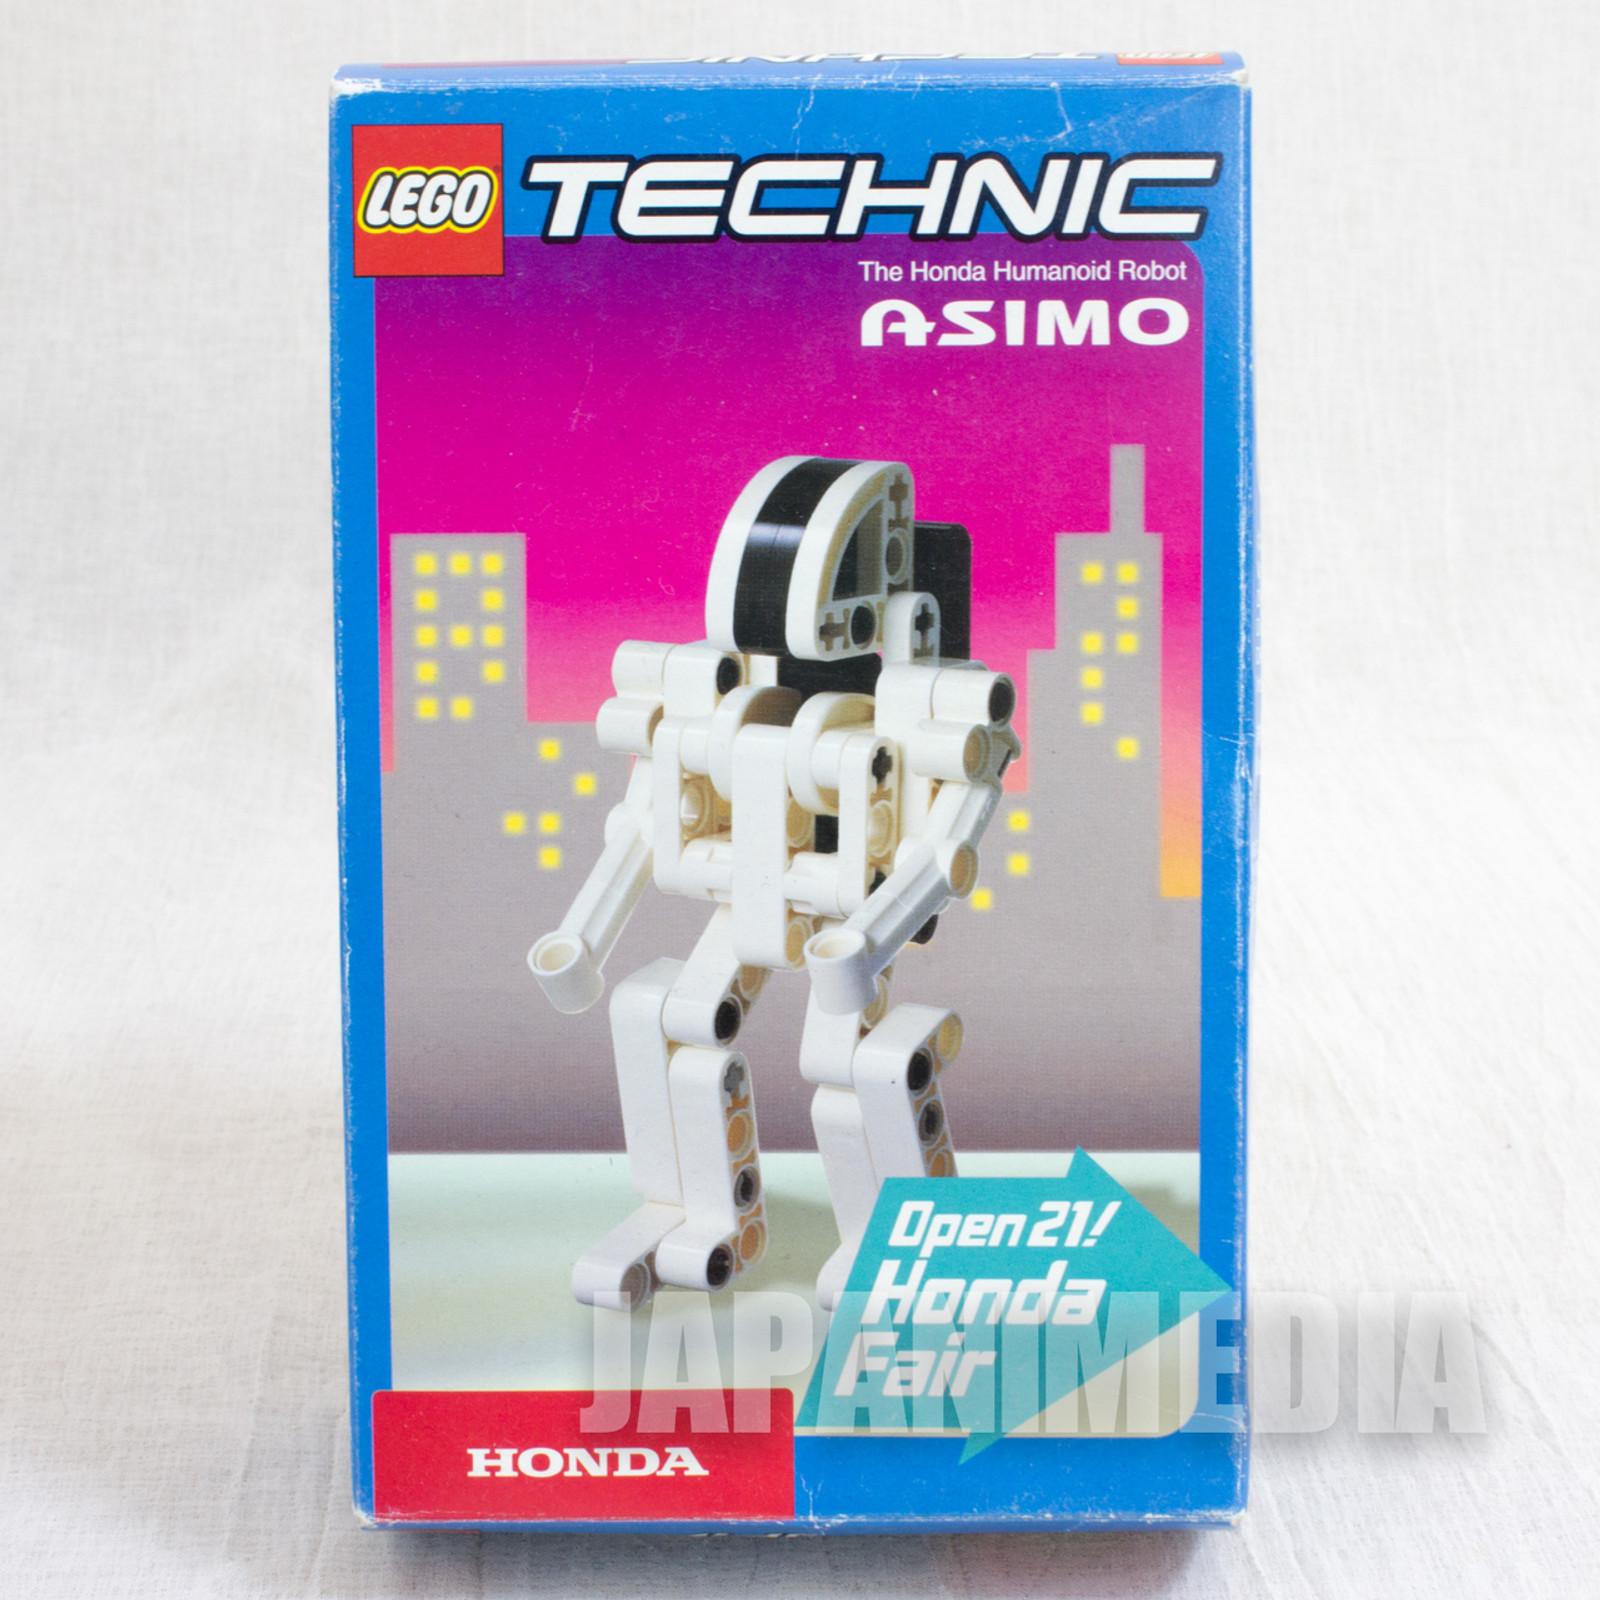 HONDA Humanoid Robot Asimo LEGO Block Toy Figure Android JAPAN